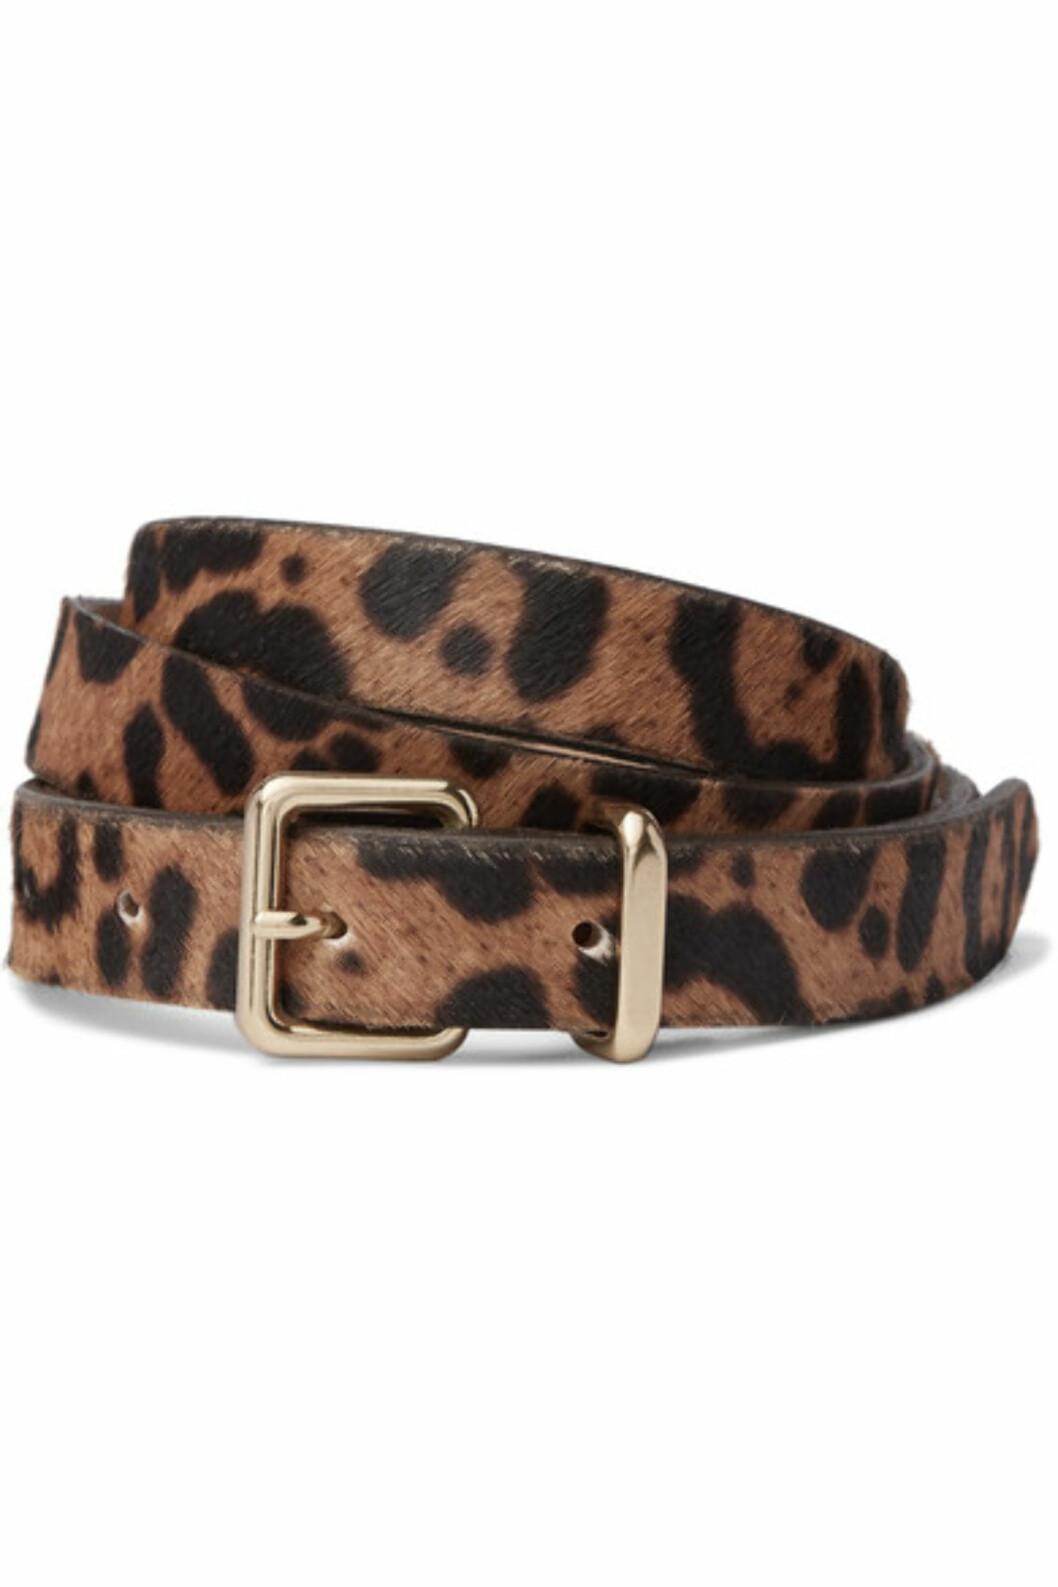 Belte fra J.Crew via Net-a-porter.com | kr 1018 | https://www.net-a-porter.com/no/en/product/784243/j_crew/leopard-print-calf-hair-belt